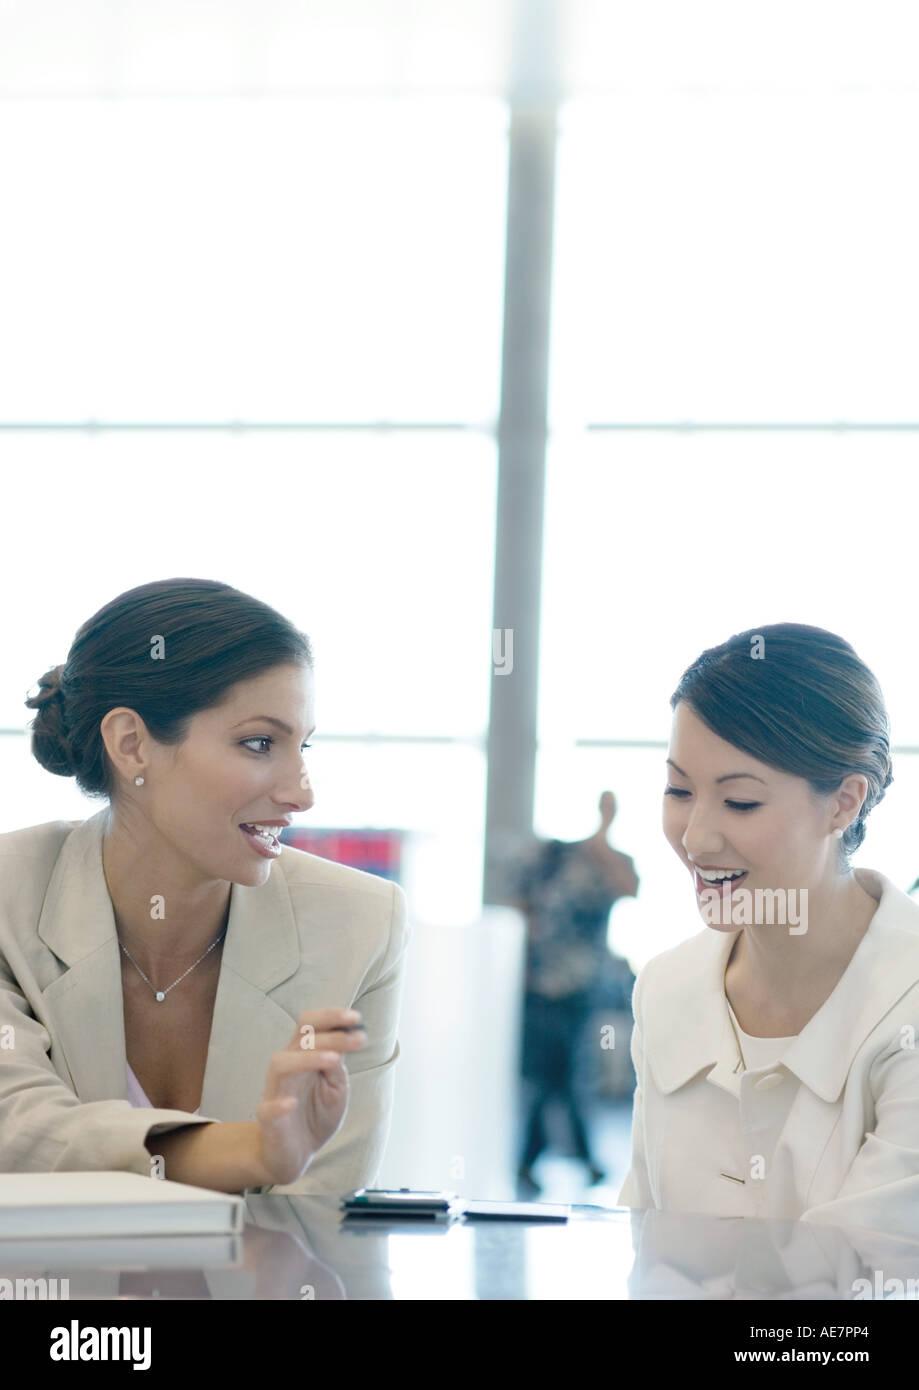 Businesswomen talking, one looking at electronic organizer - Stock Image